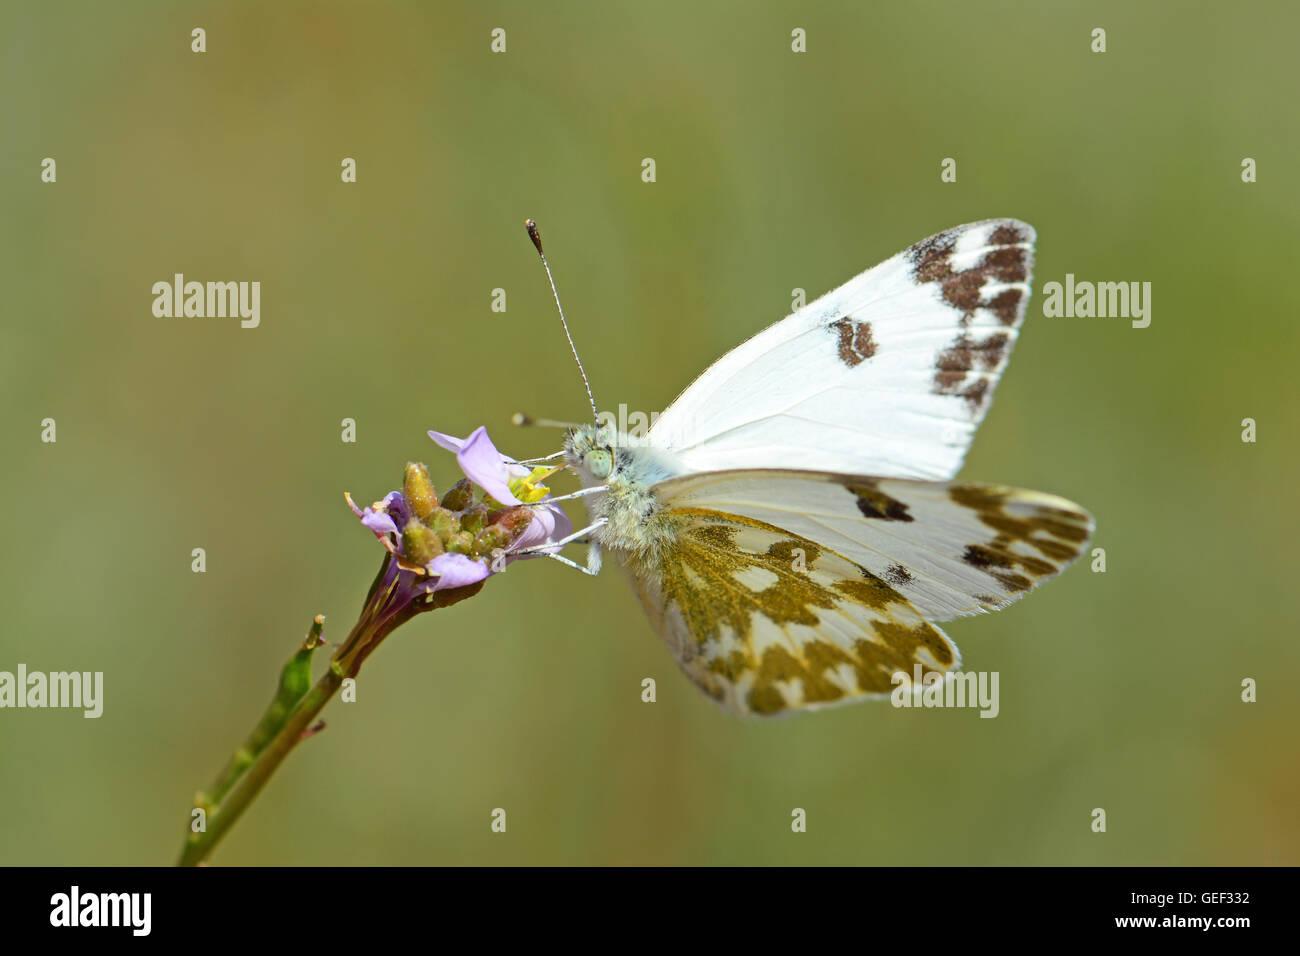 Schmetterling, Pontia Daplidice, saugen Nektar Stockbild